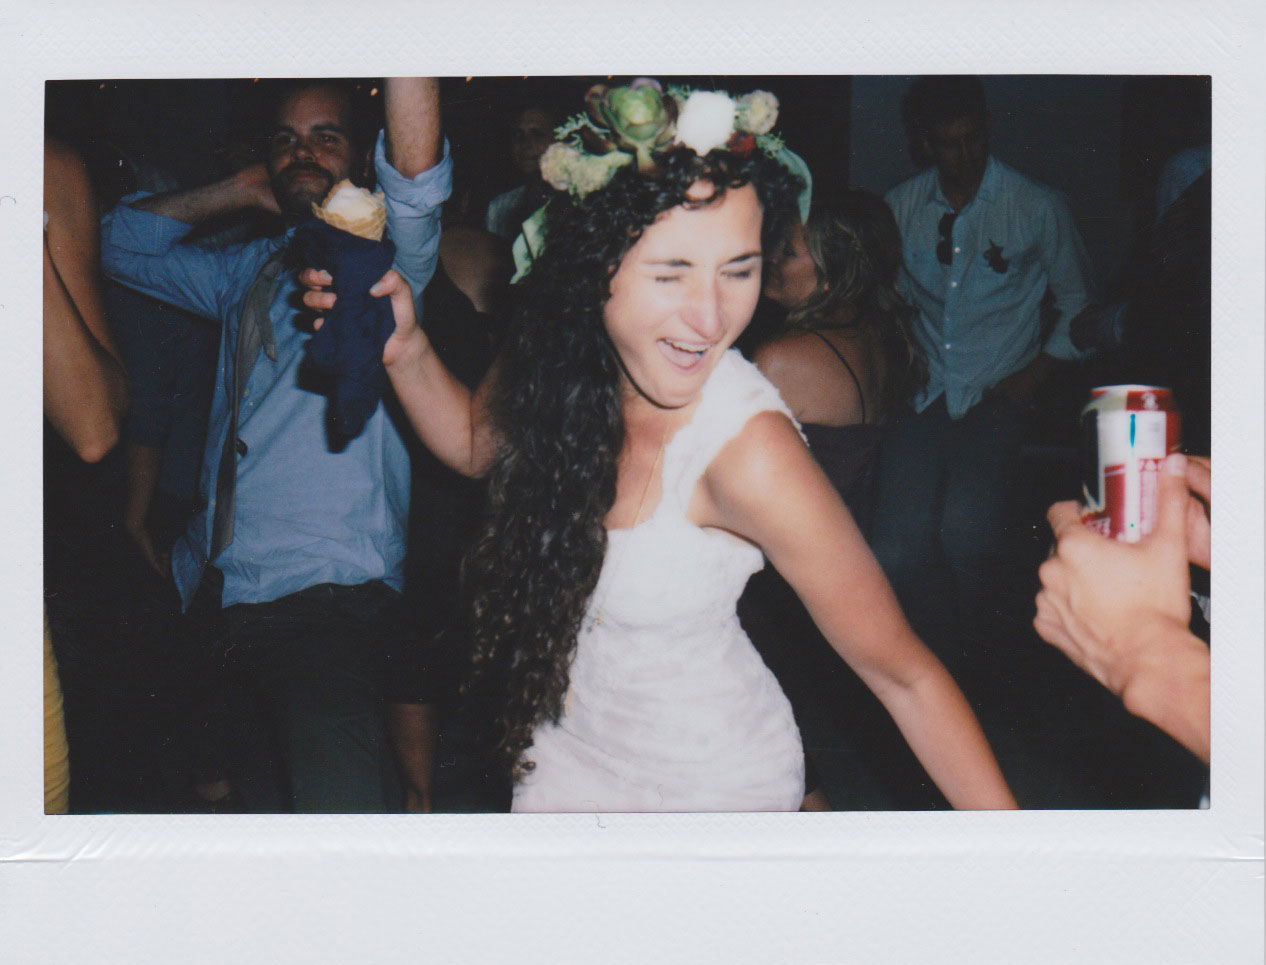 team-aromma-wedding-2.jpg